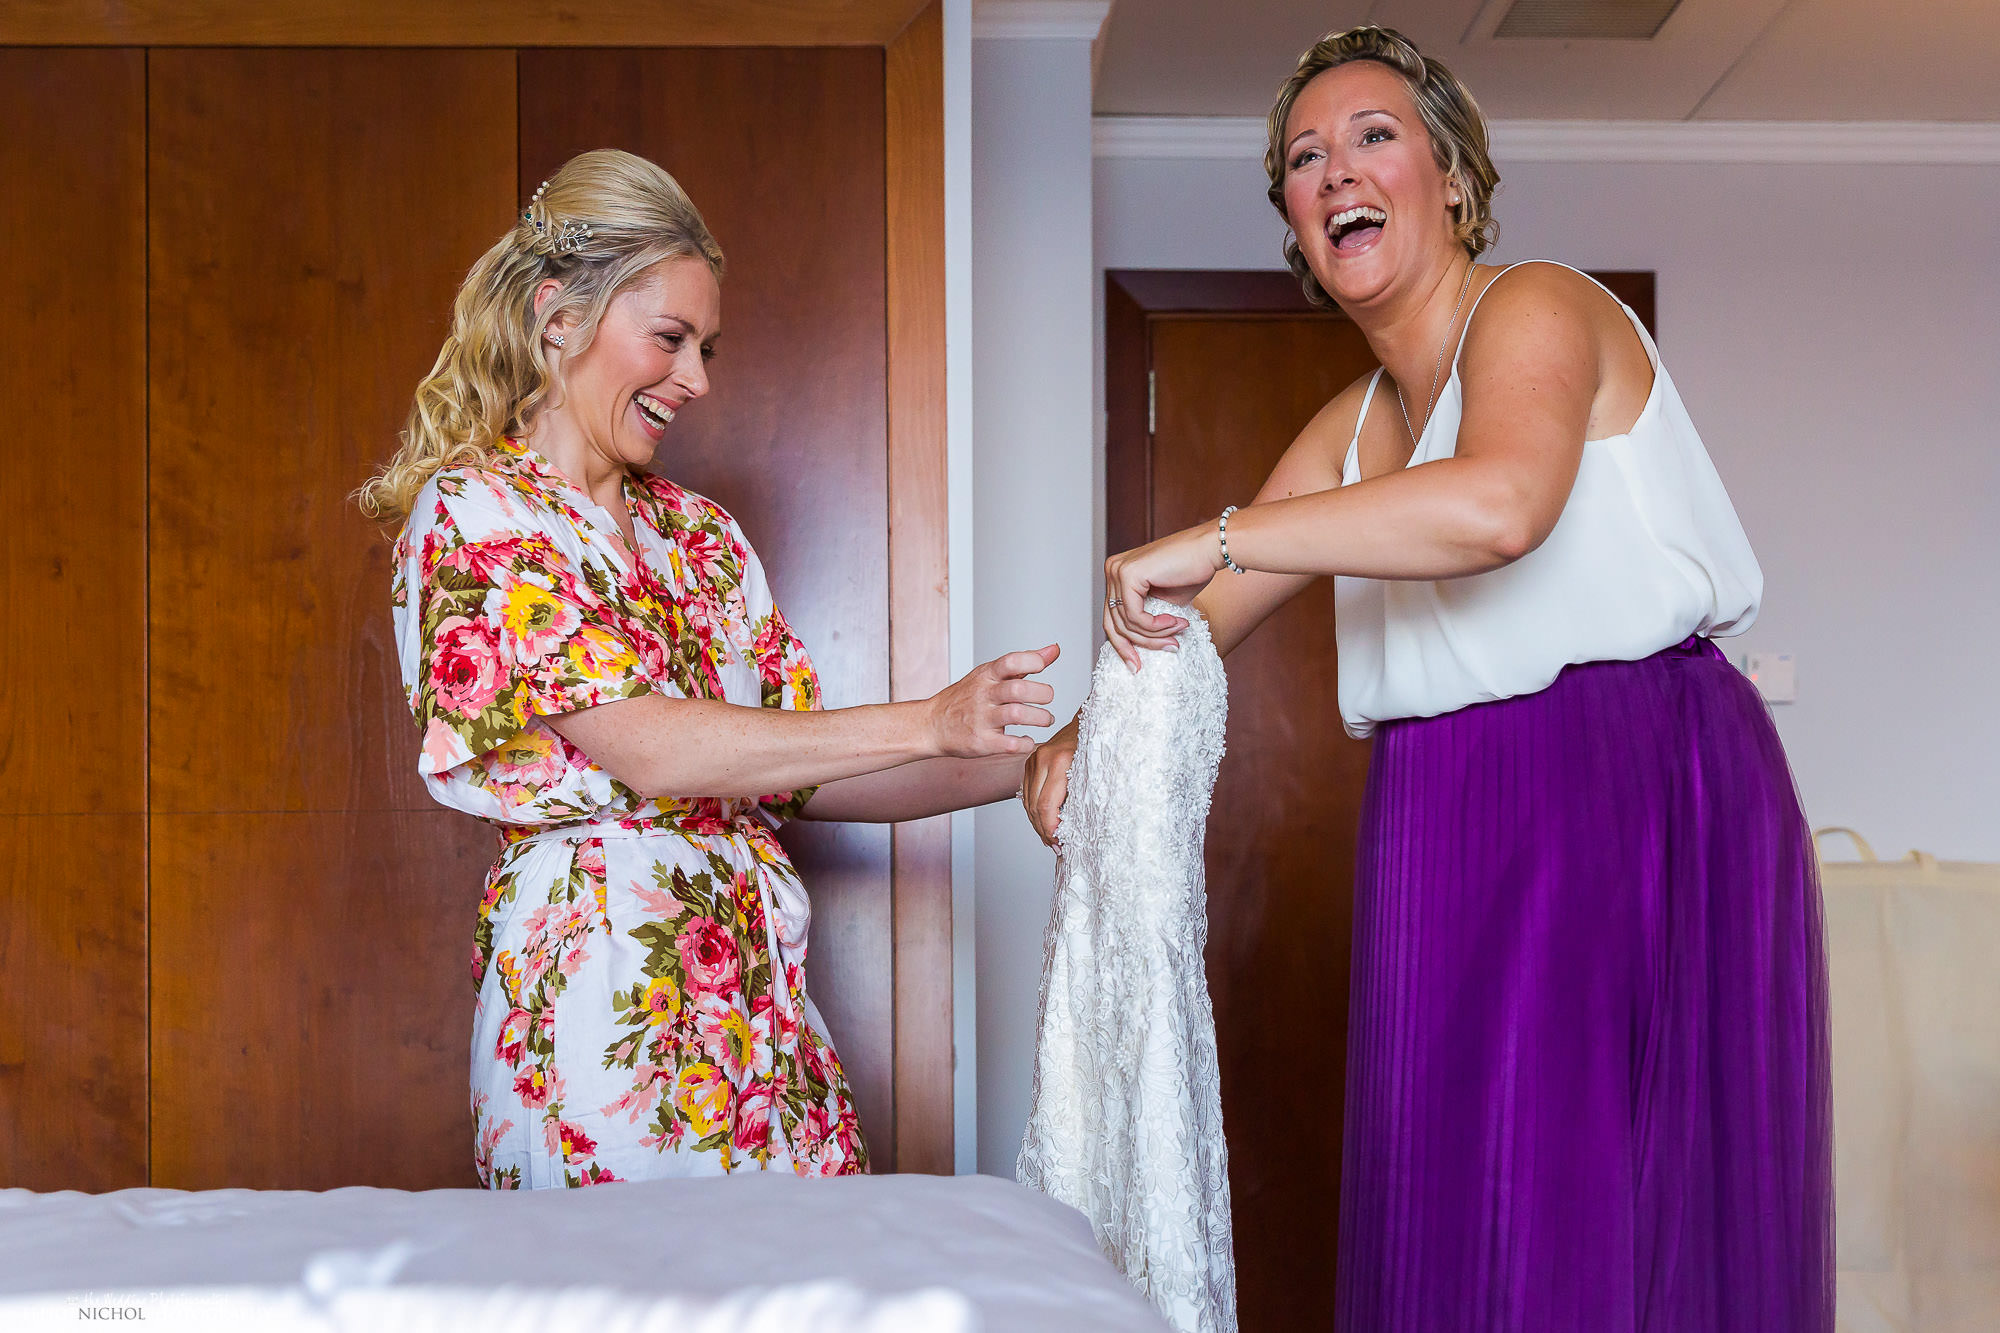 bride-dress-fun-wedding-photography-photographer-bridesmaid-getting-ready